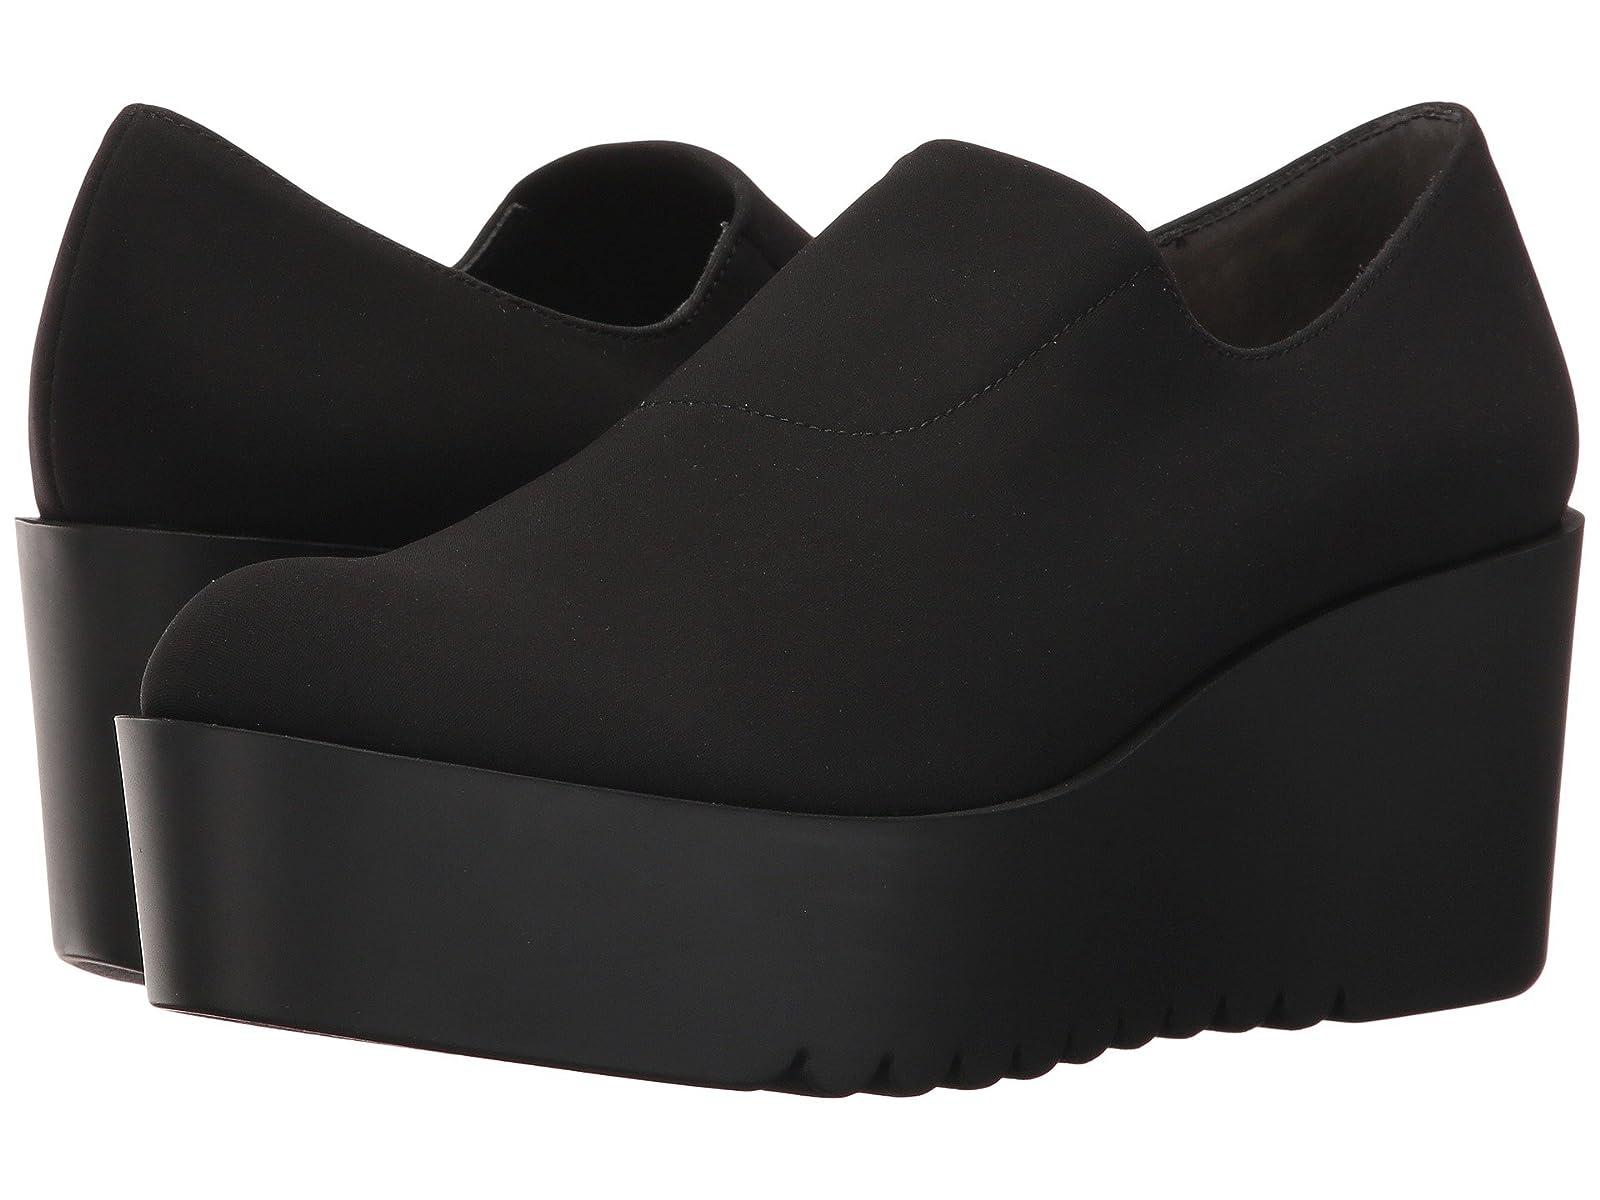 Donald J Pliner CapeAtmospheric grades have affordable shoes